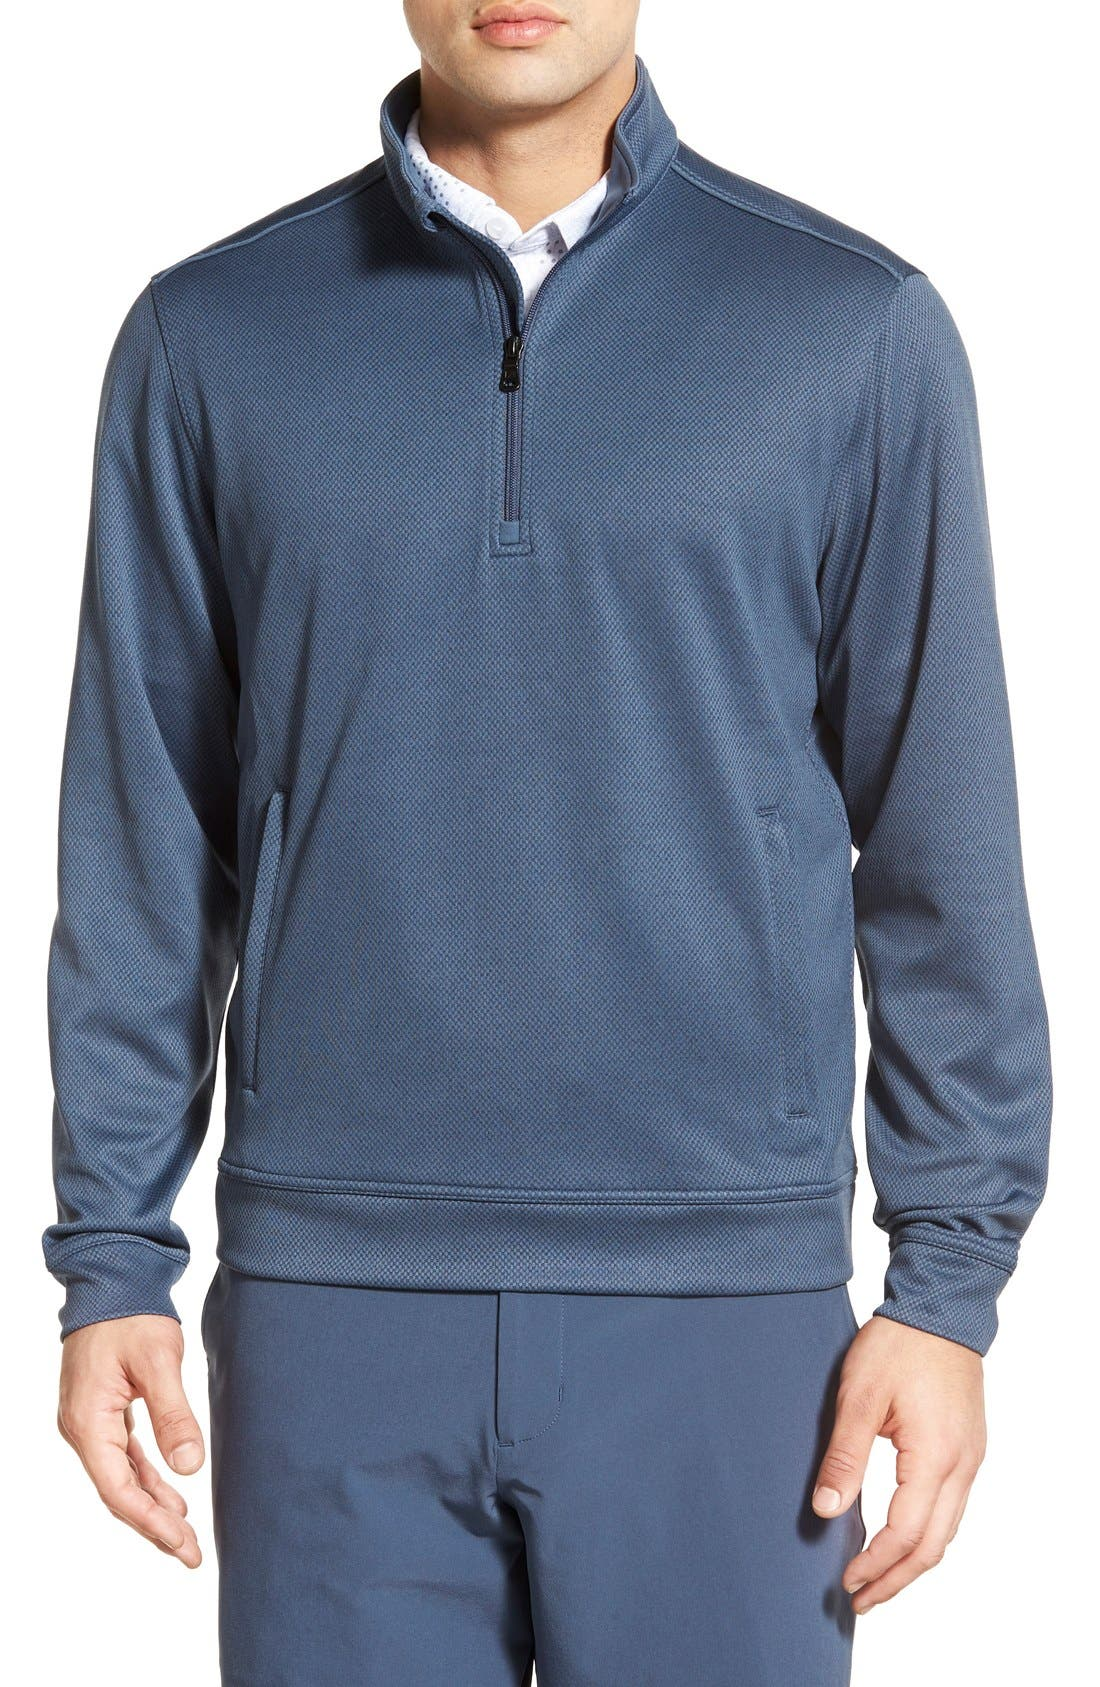 'Weather Tec Orbit' Half Zip Pullover,                             Main thumbnail 1, color,                             015